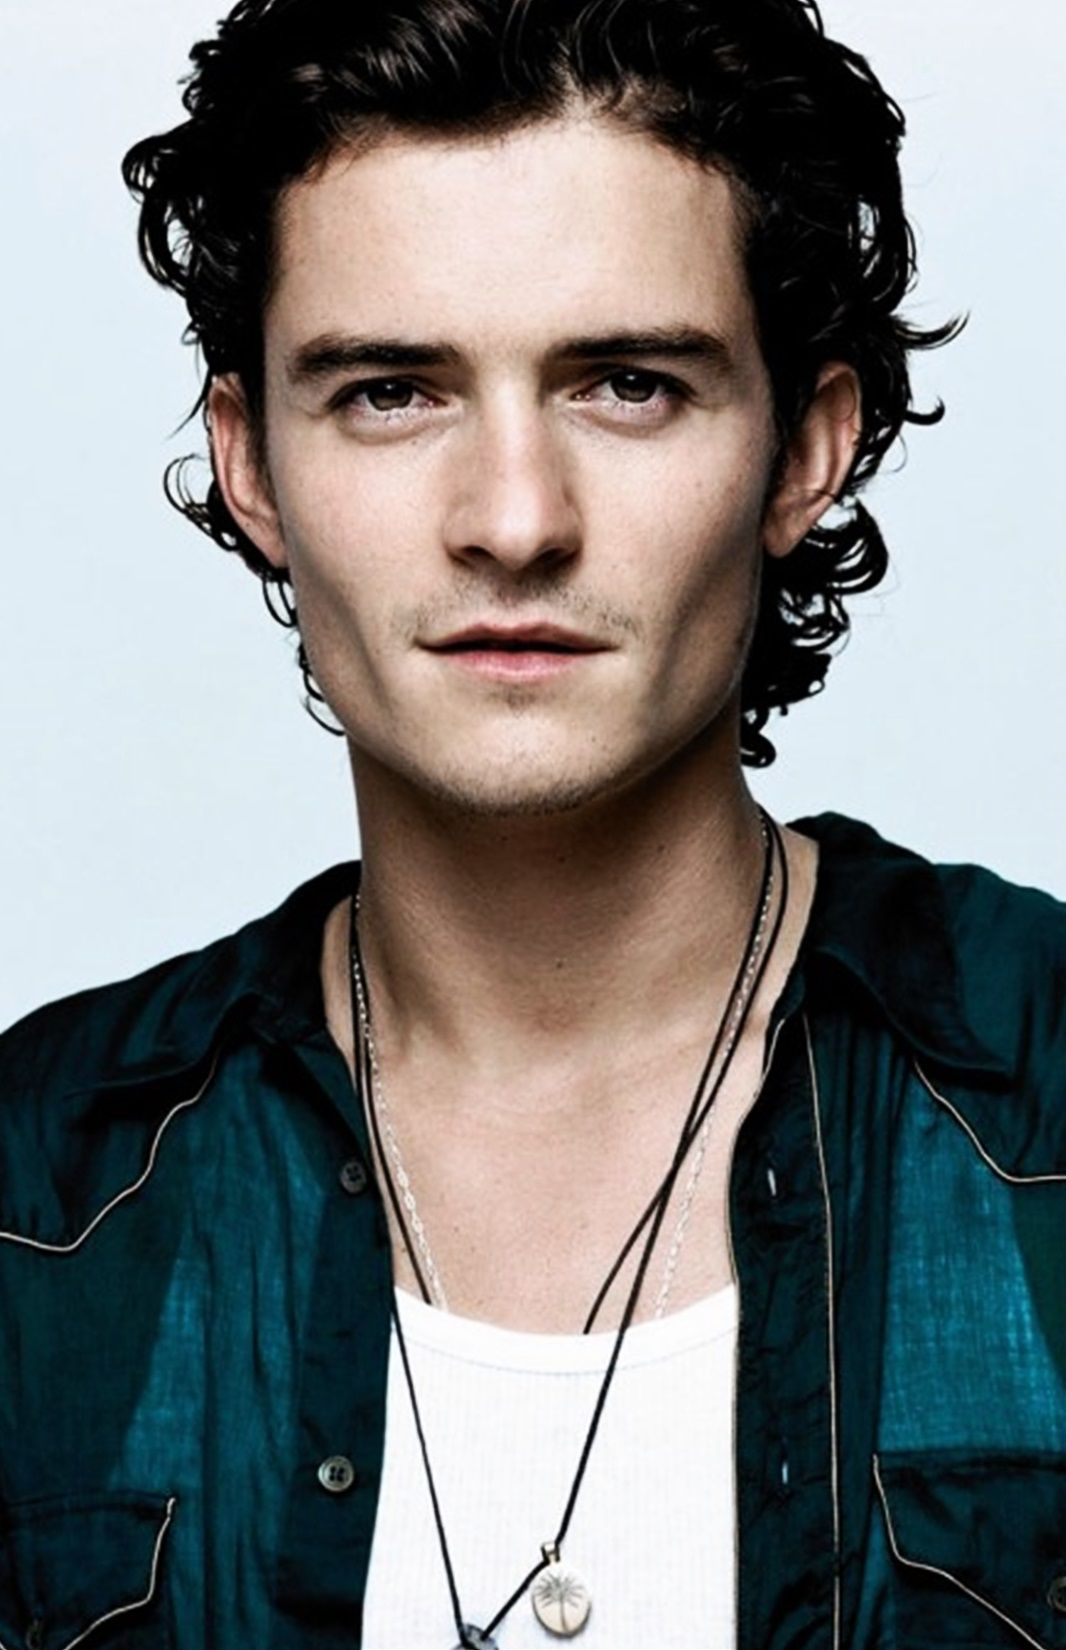 Orlando Bloom (born 1977)